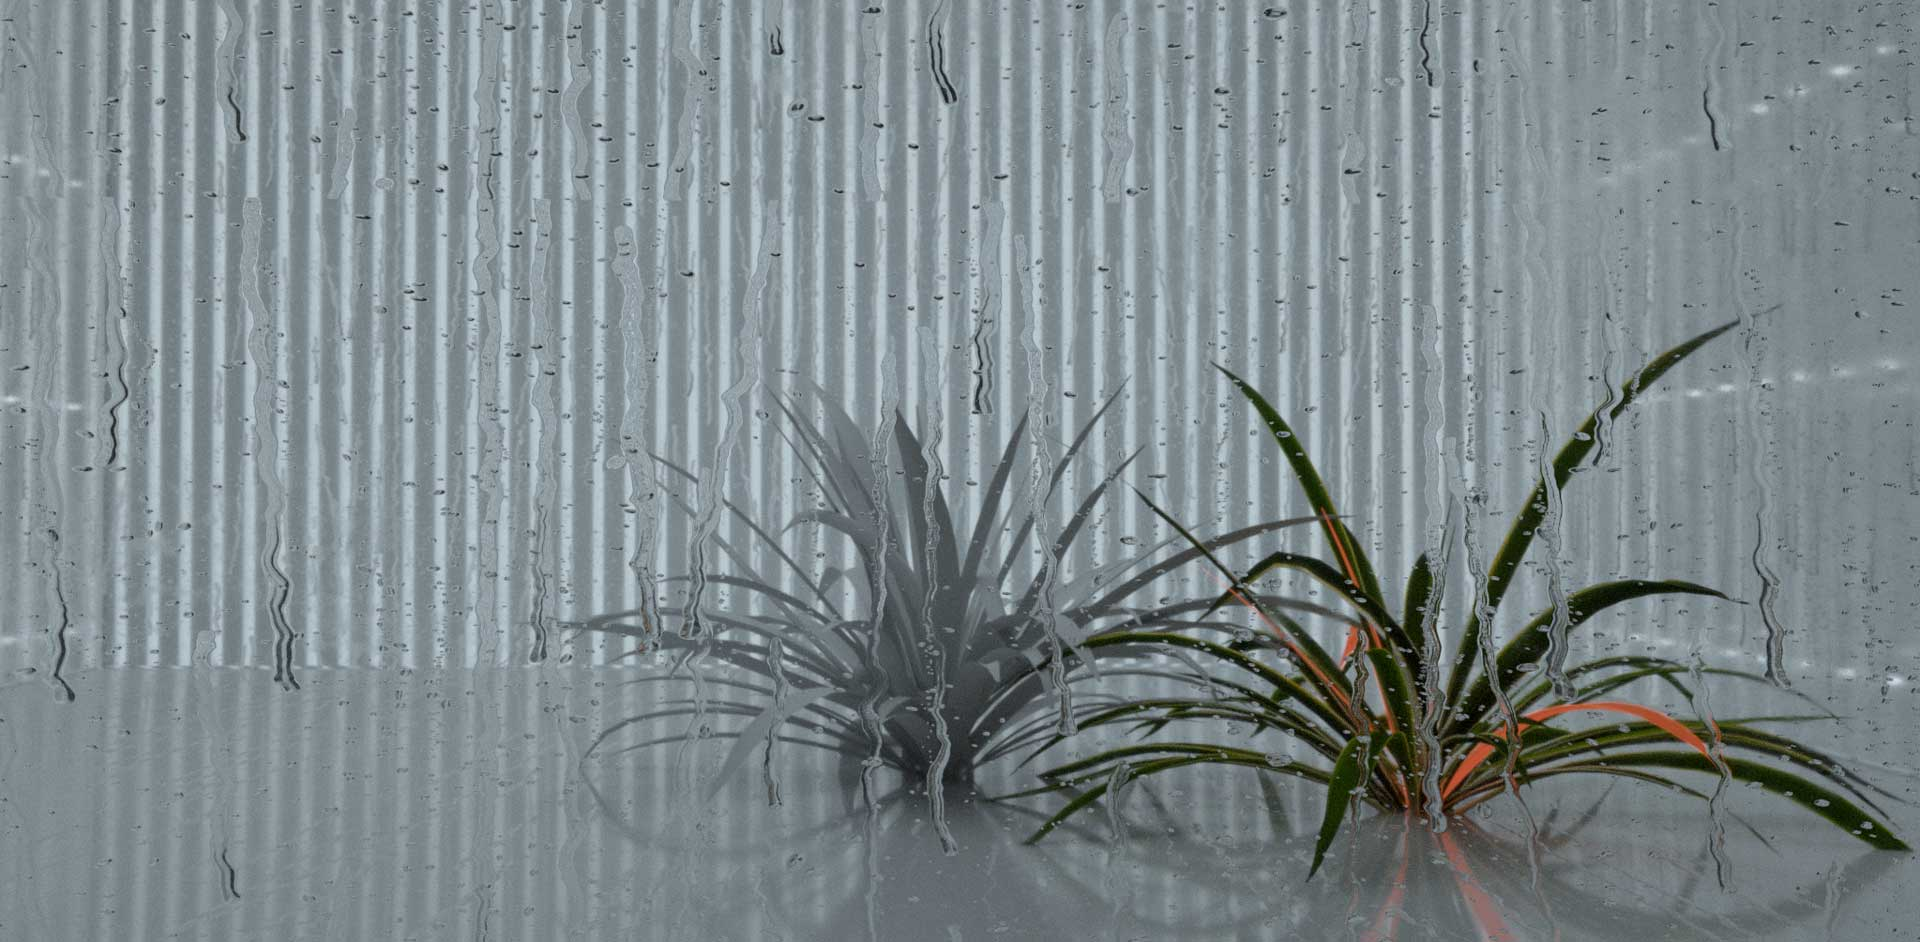 artificial-life-plant-awakening